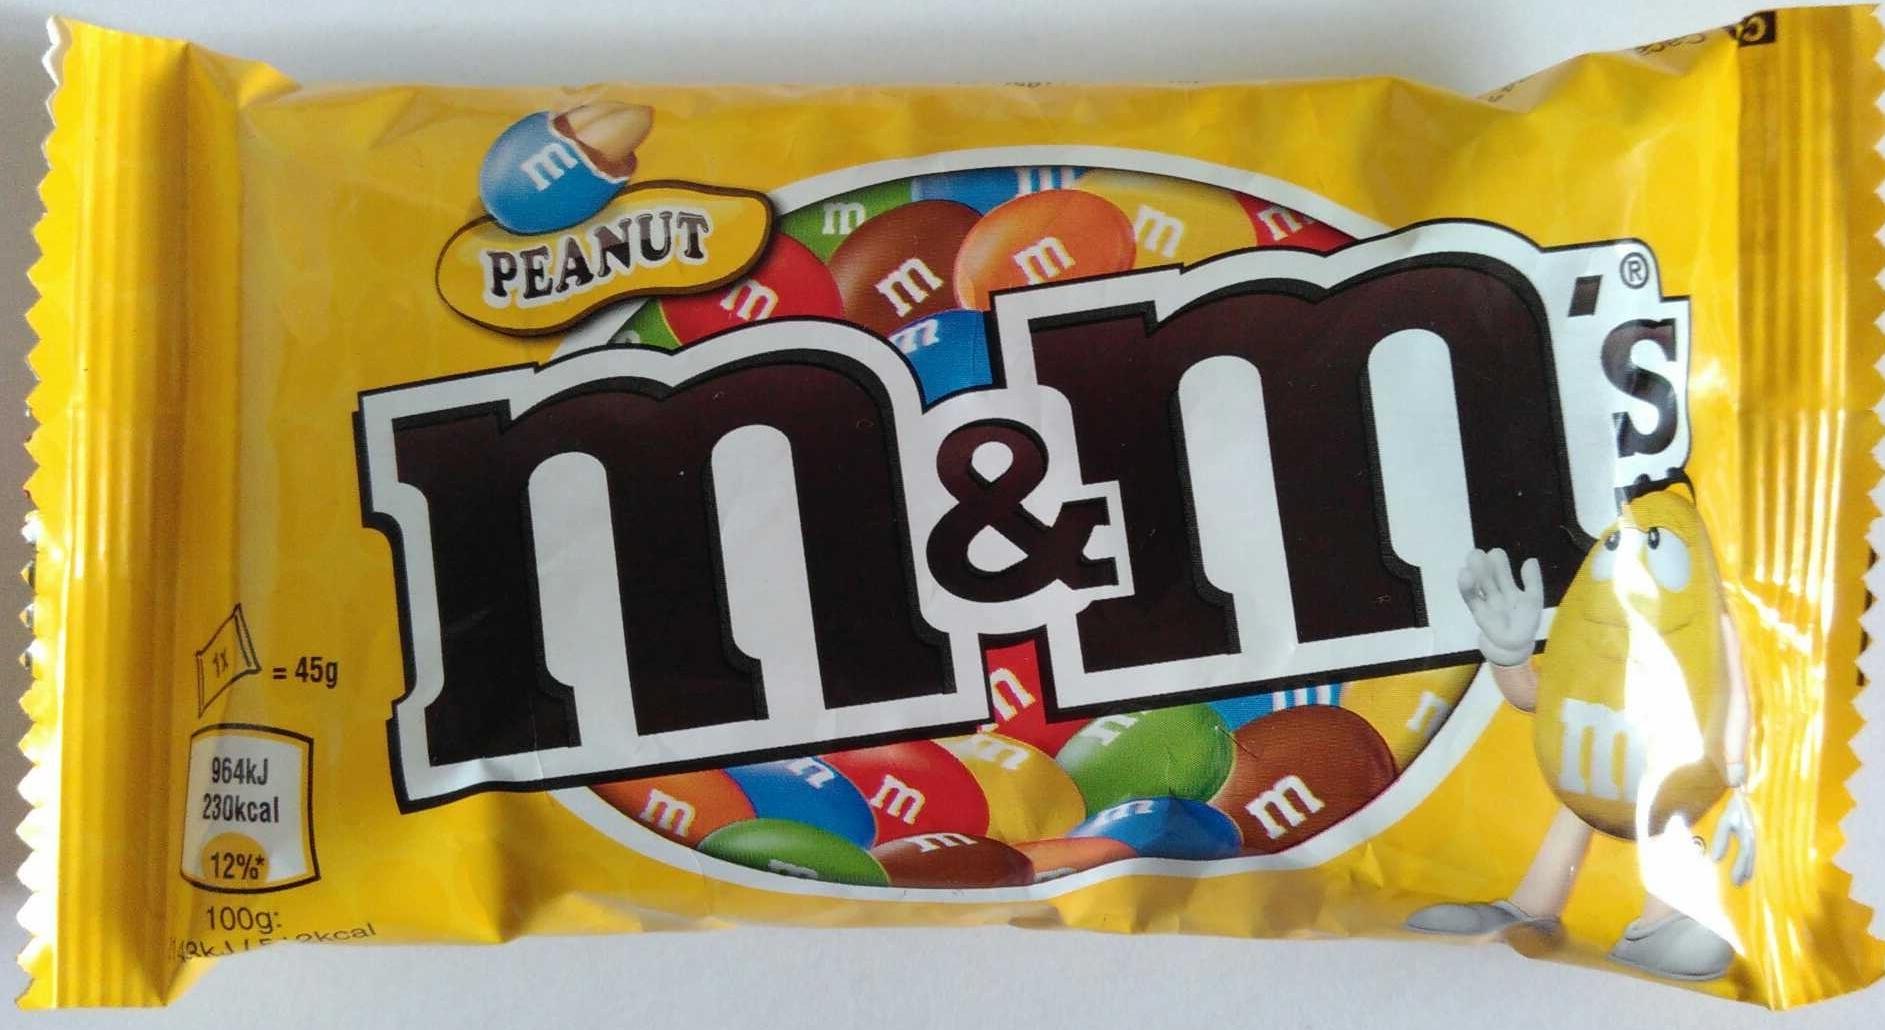 m&m's Peanut - Produto